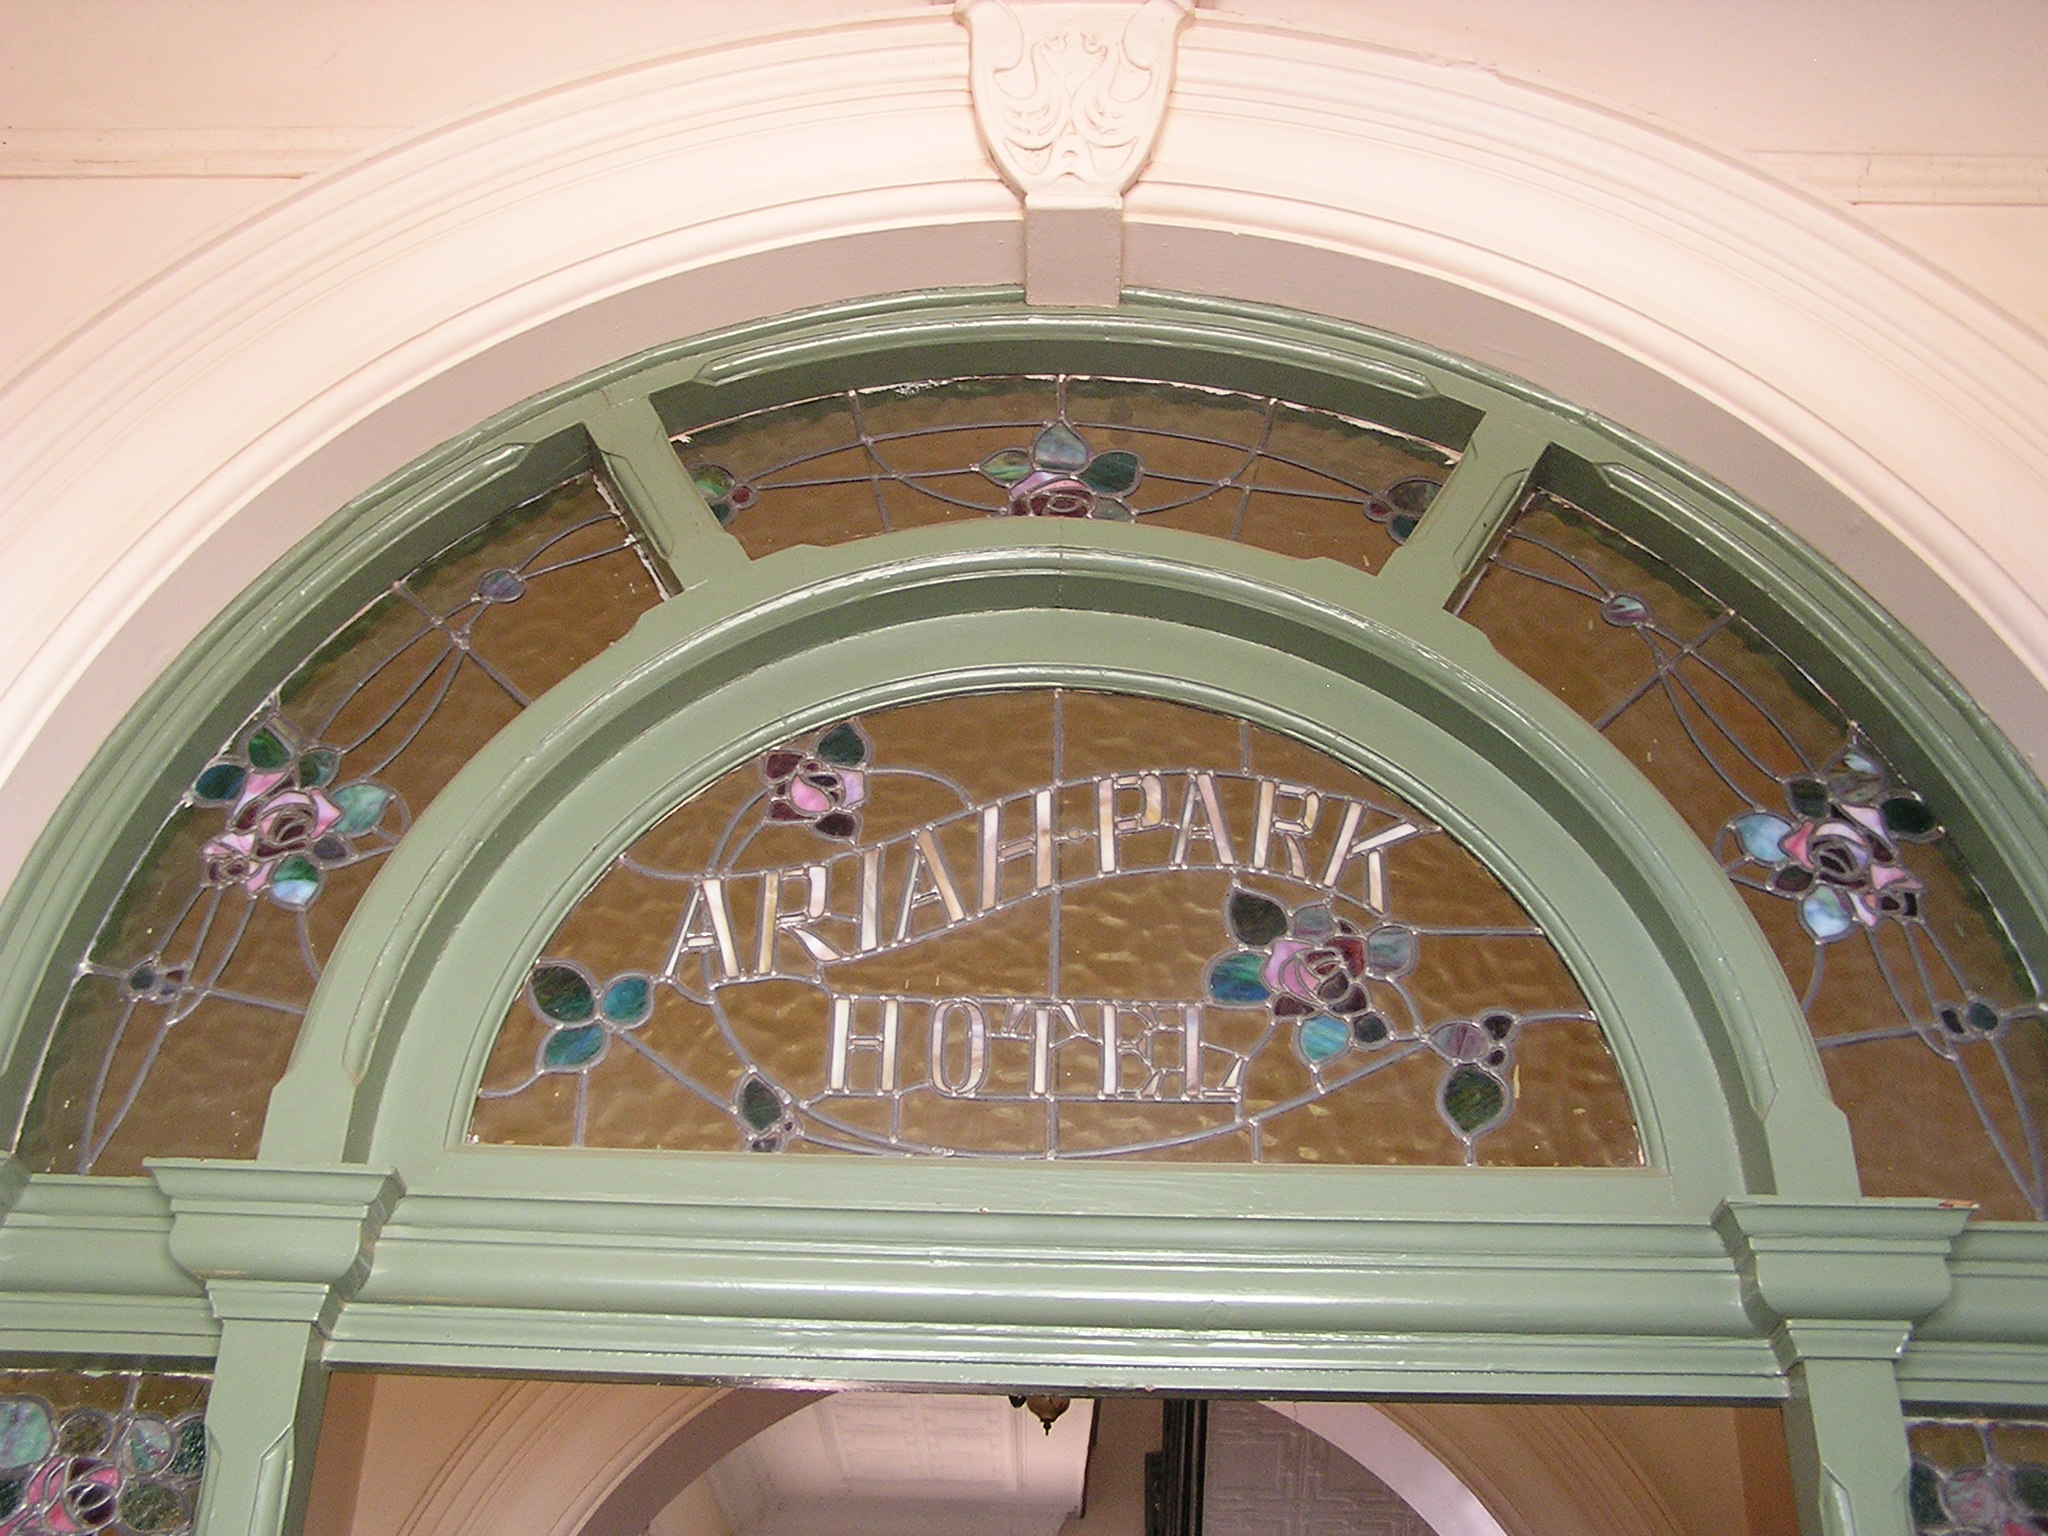 ariahparkhotelleadlight.jpg